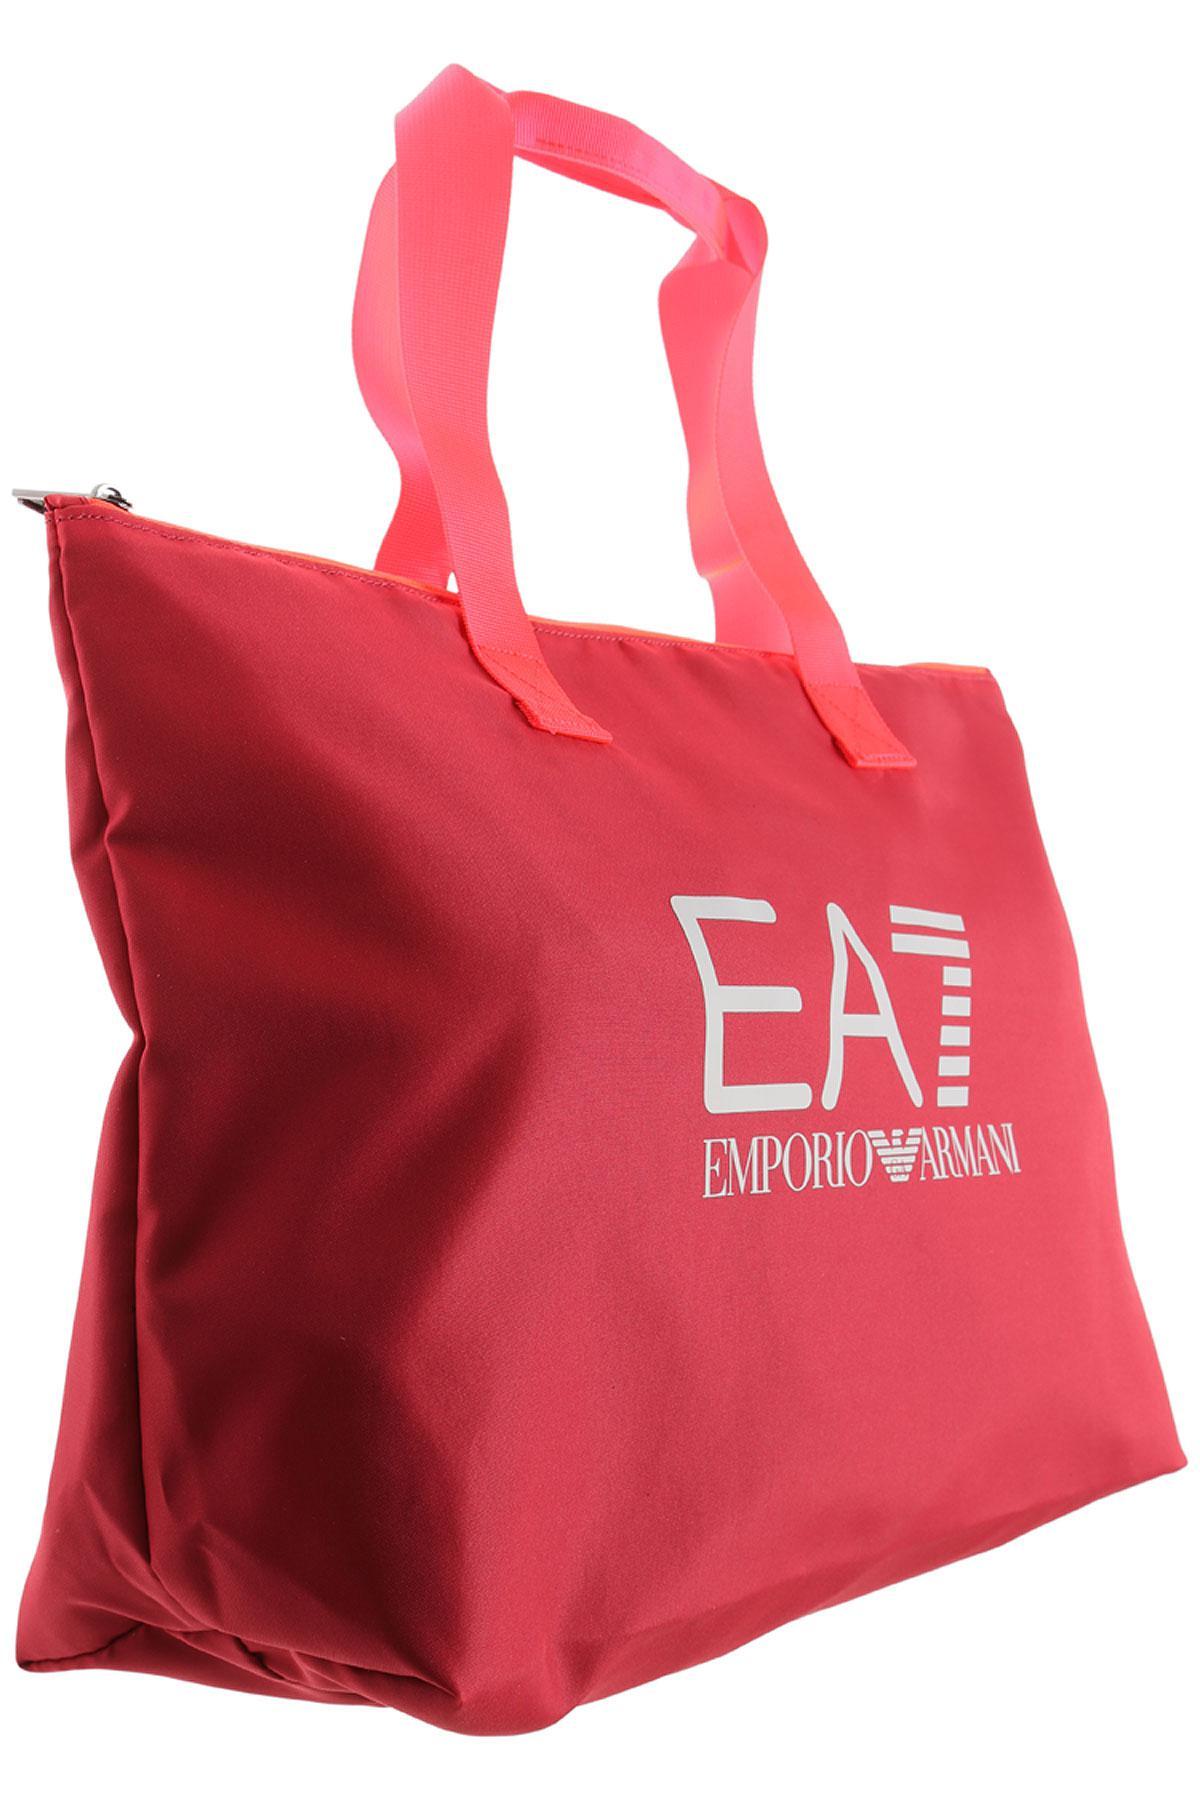 7ff4034b26d5 Lyst - Giorgio Armani Handbags in Red - Save 5.555555555555557%